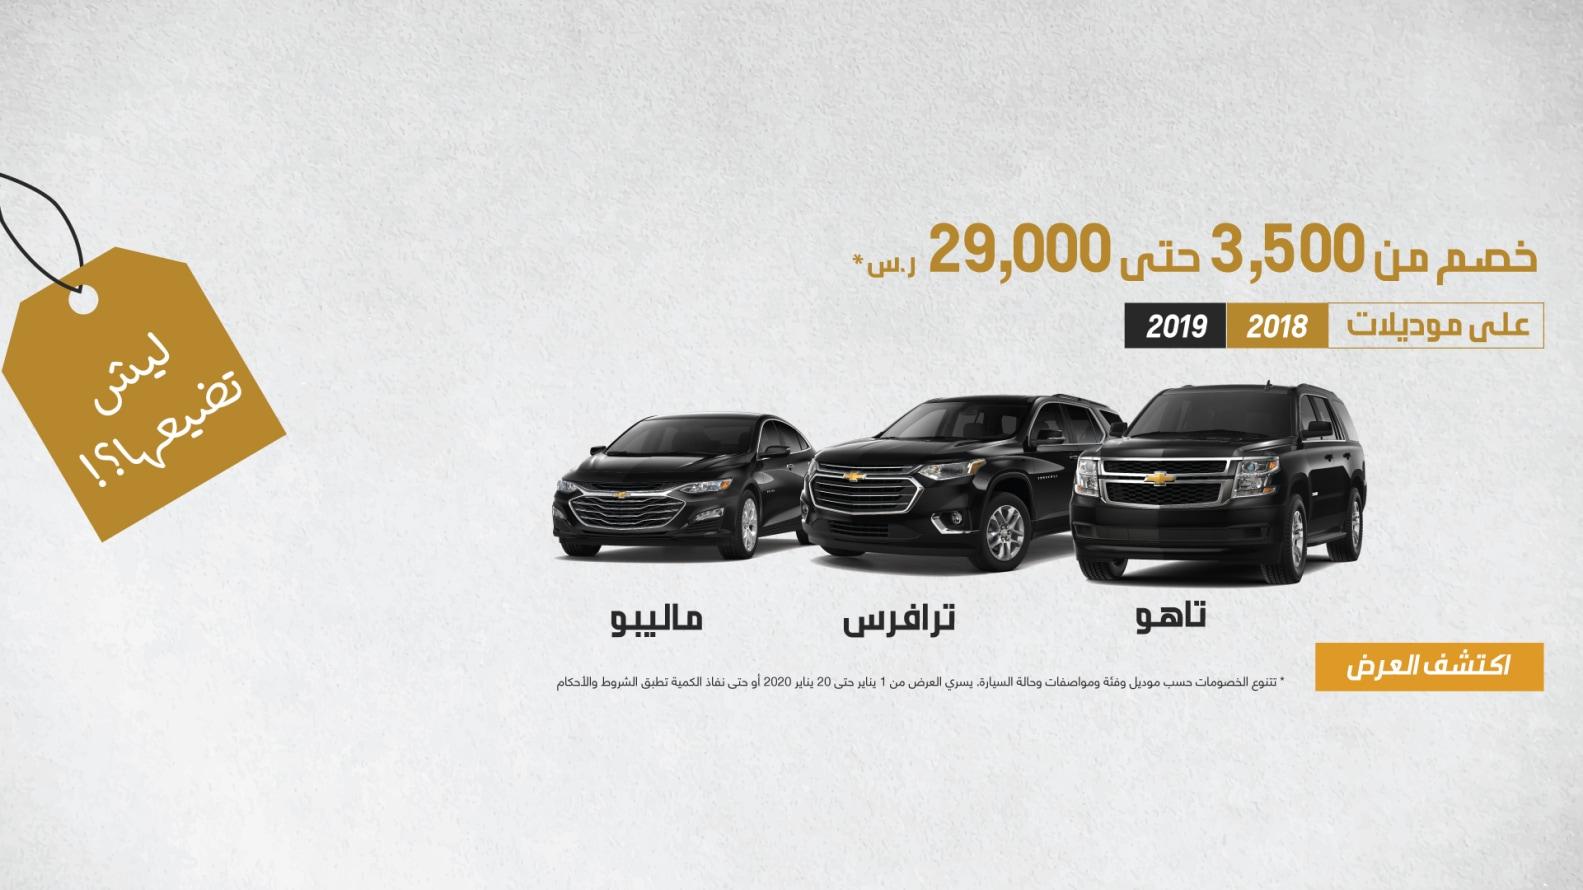 عروض شفروليه موديلات 2018 & 2019